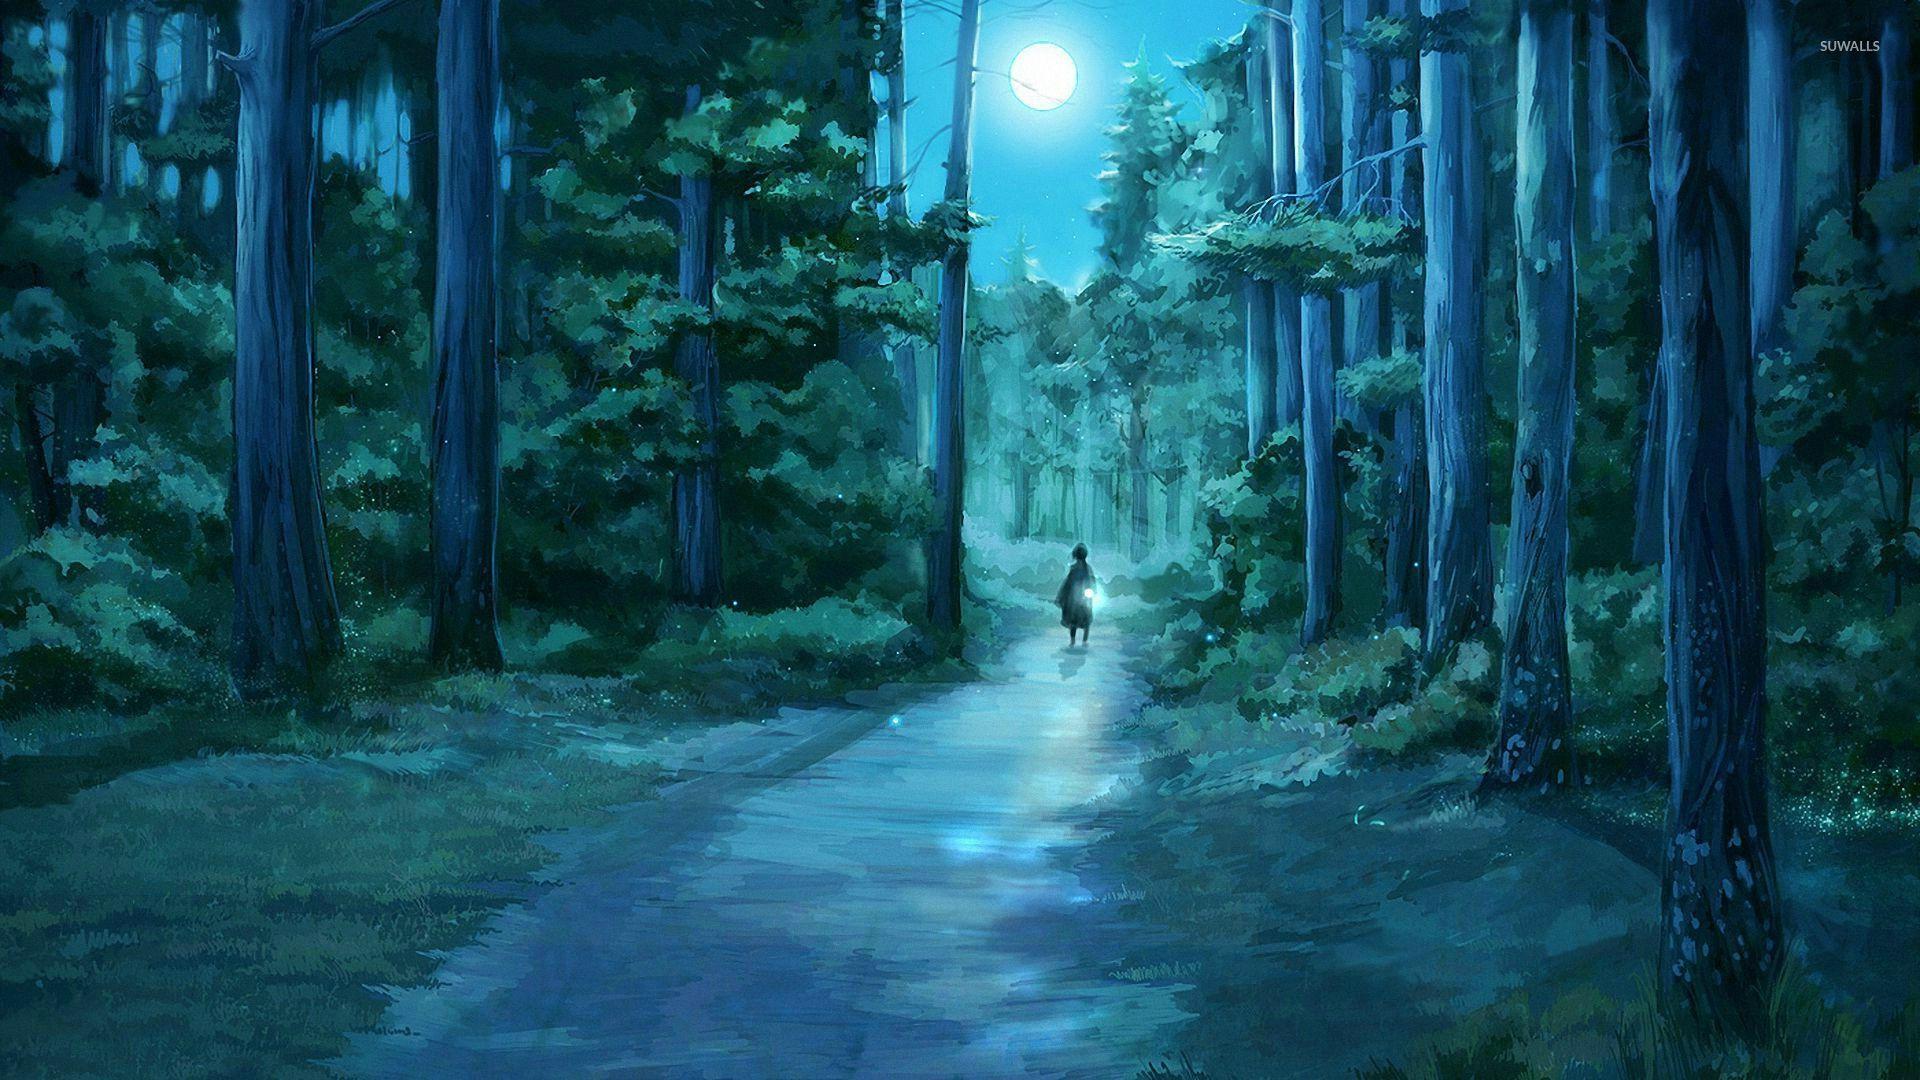 Simple Wallpaper Forest Girl - girl-through-the-moonlit-forest-27155-1920x1080  2018_981375 .jpg